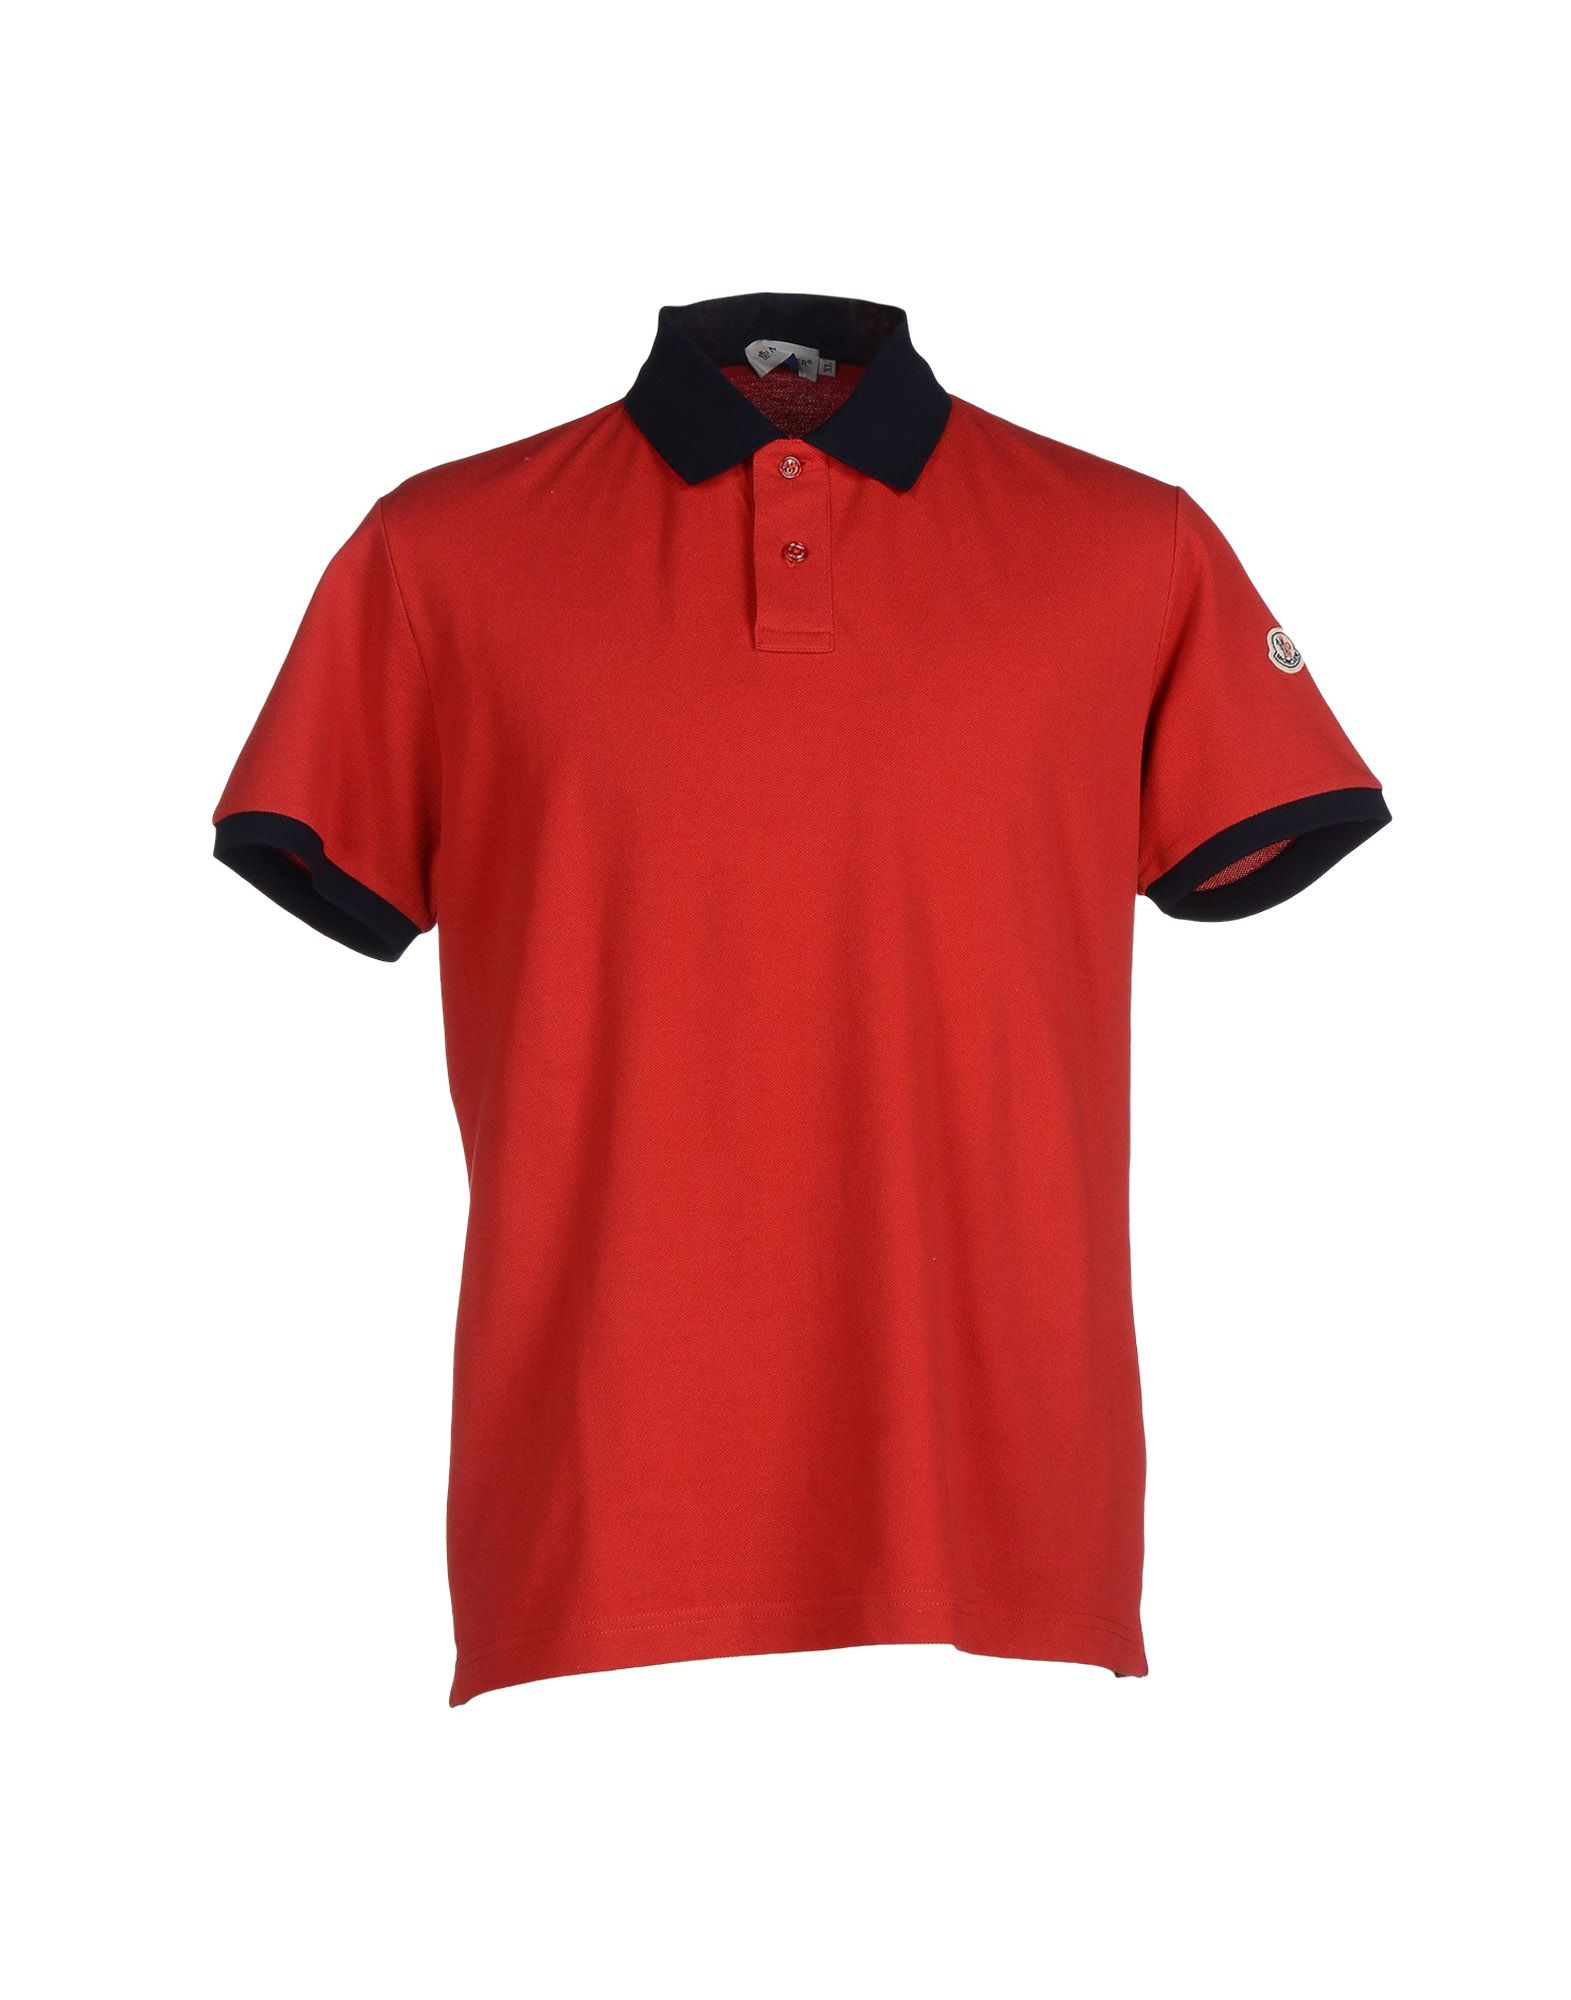 mens red moncler t shirt